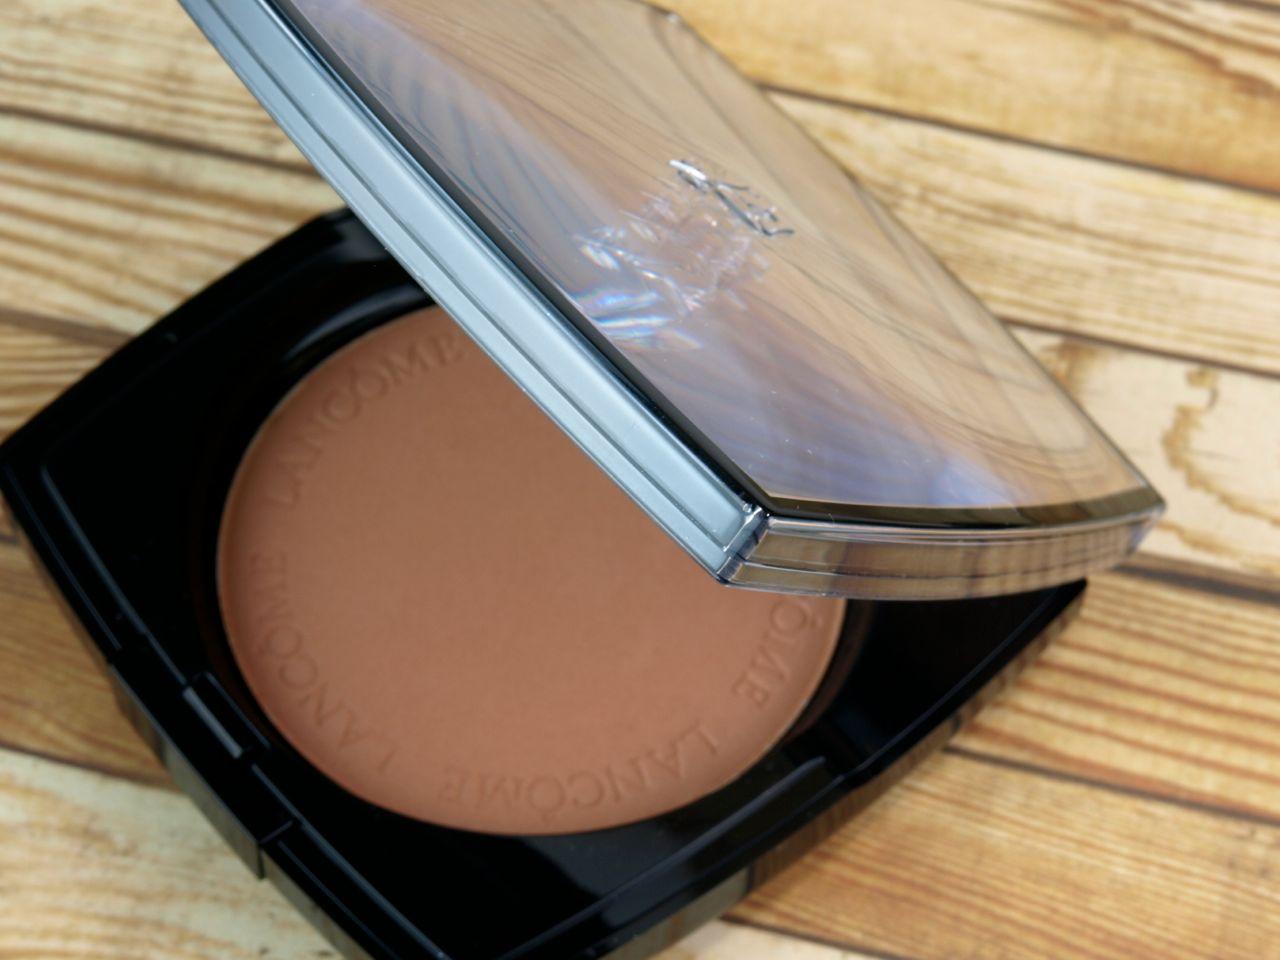 4866b547f Lancome Belle de Teint Natural Healthy Glow Sheer Blurring Powder in ...